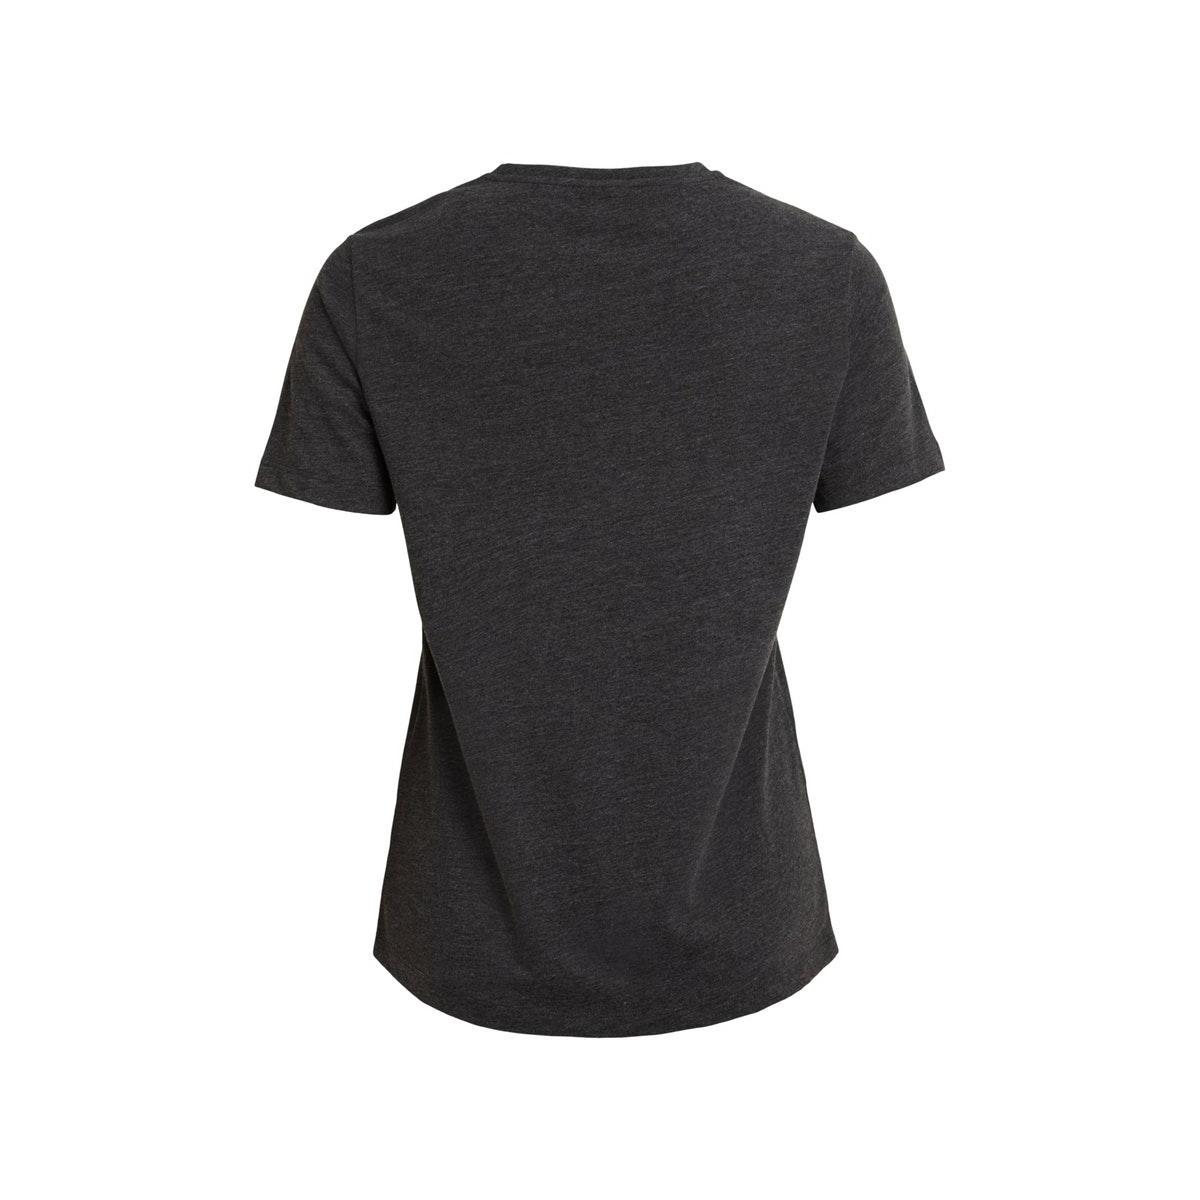 vihaffy t-shirt 14062157 vila t-shirt dark grey mel/perfect